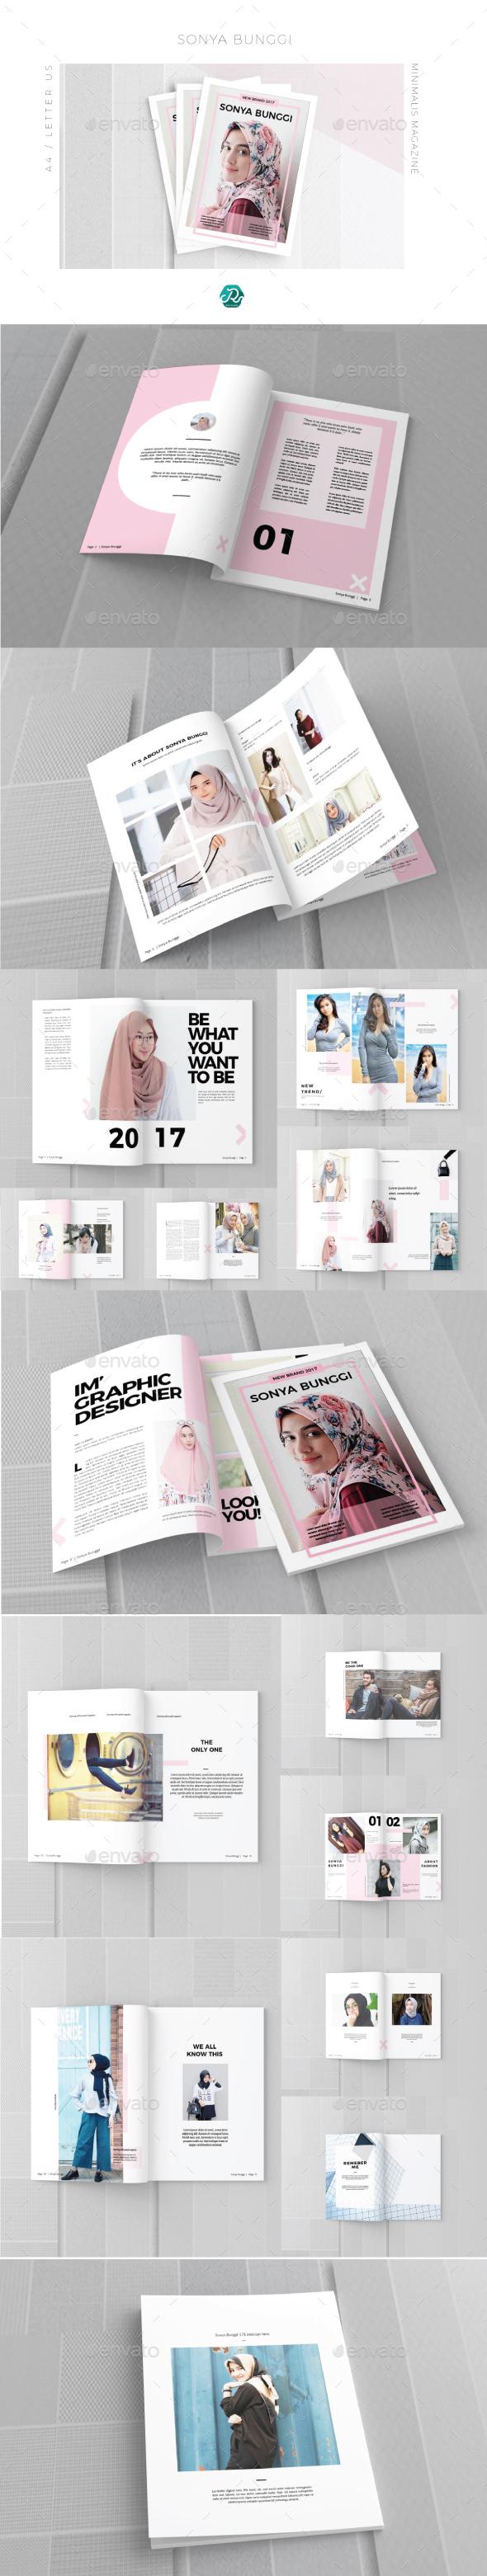 GraphicRiver Sonya Bunggi Magazine 21163255